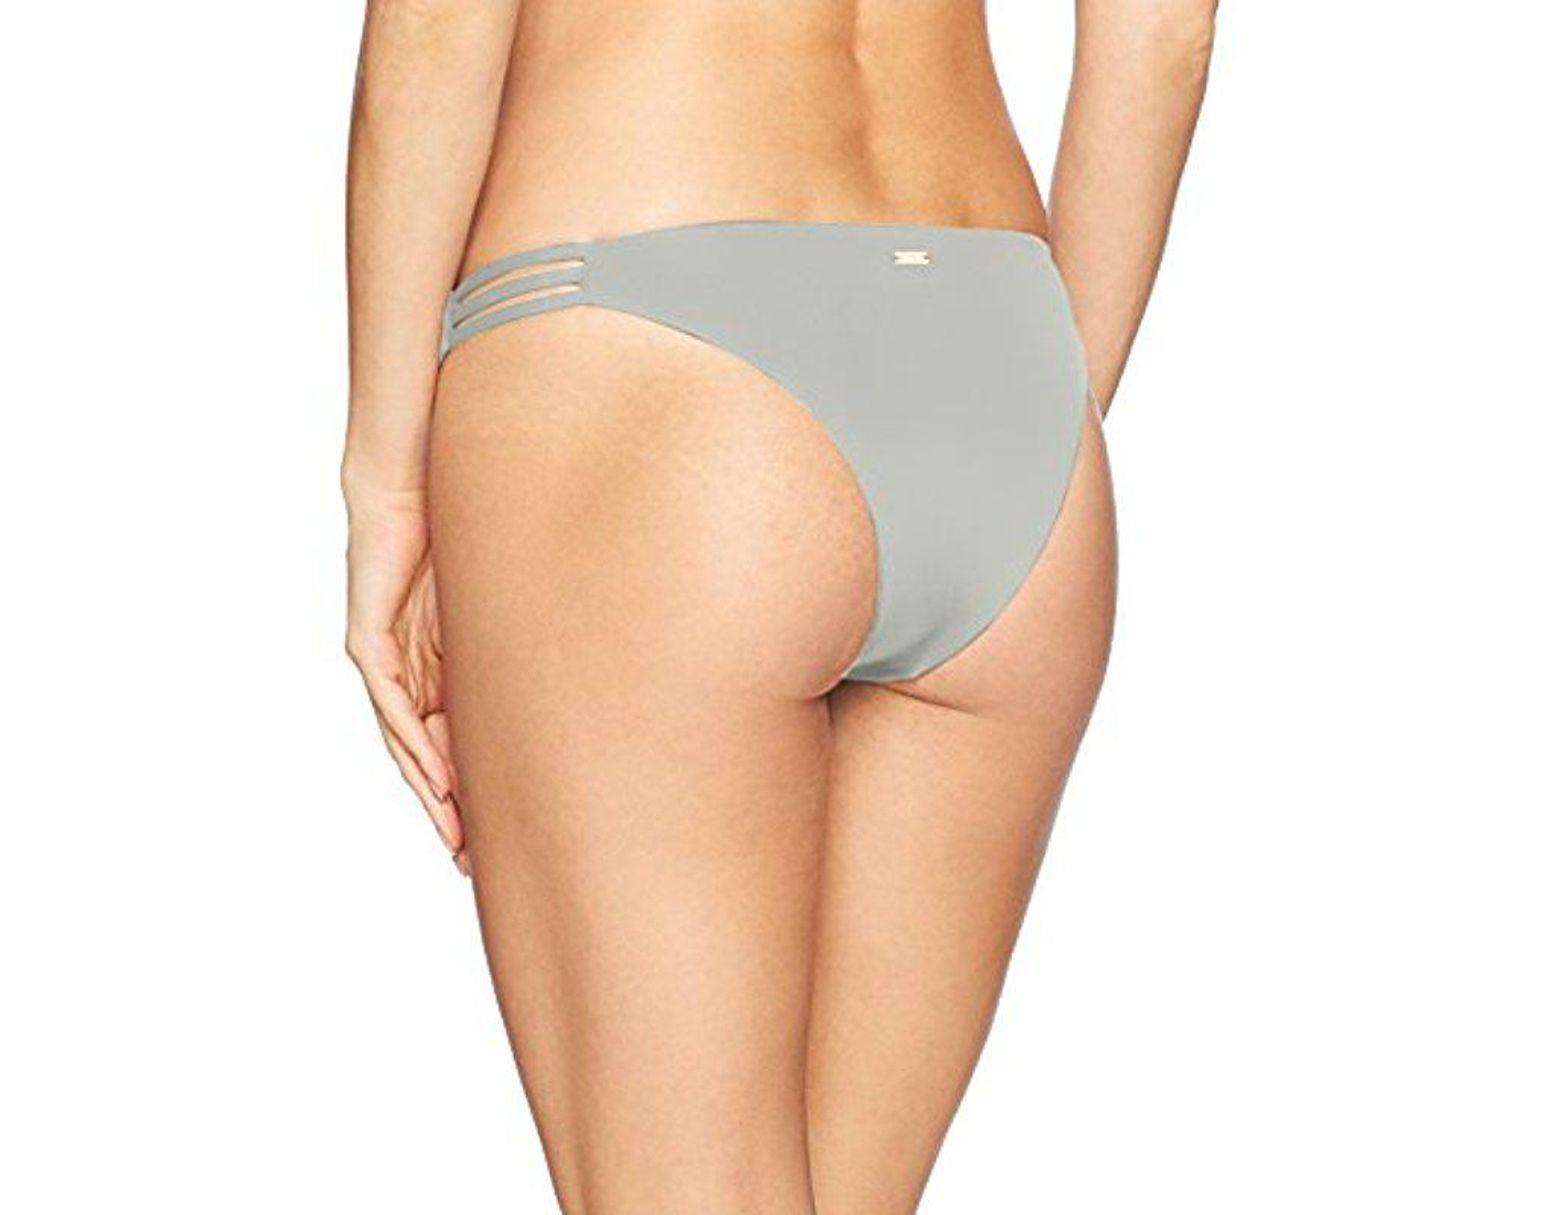 f552ab2939c Lyst - Roxy Softly Love Surfer Swimsuit Bikini Bottom - Save 37%